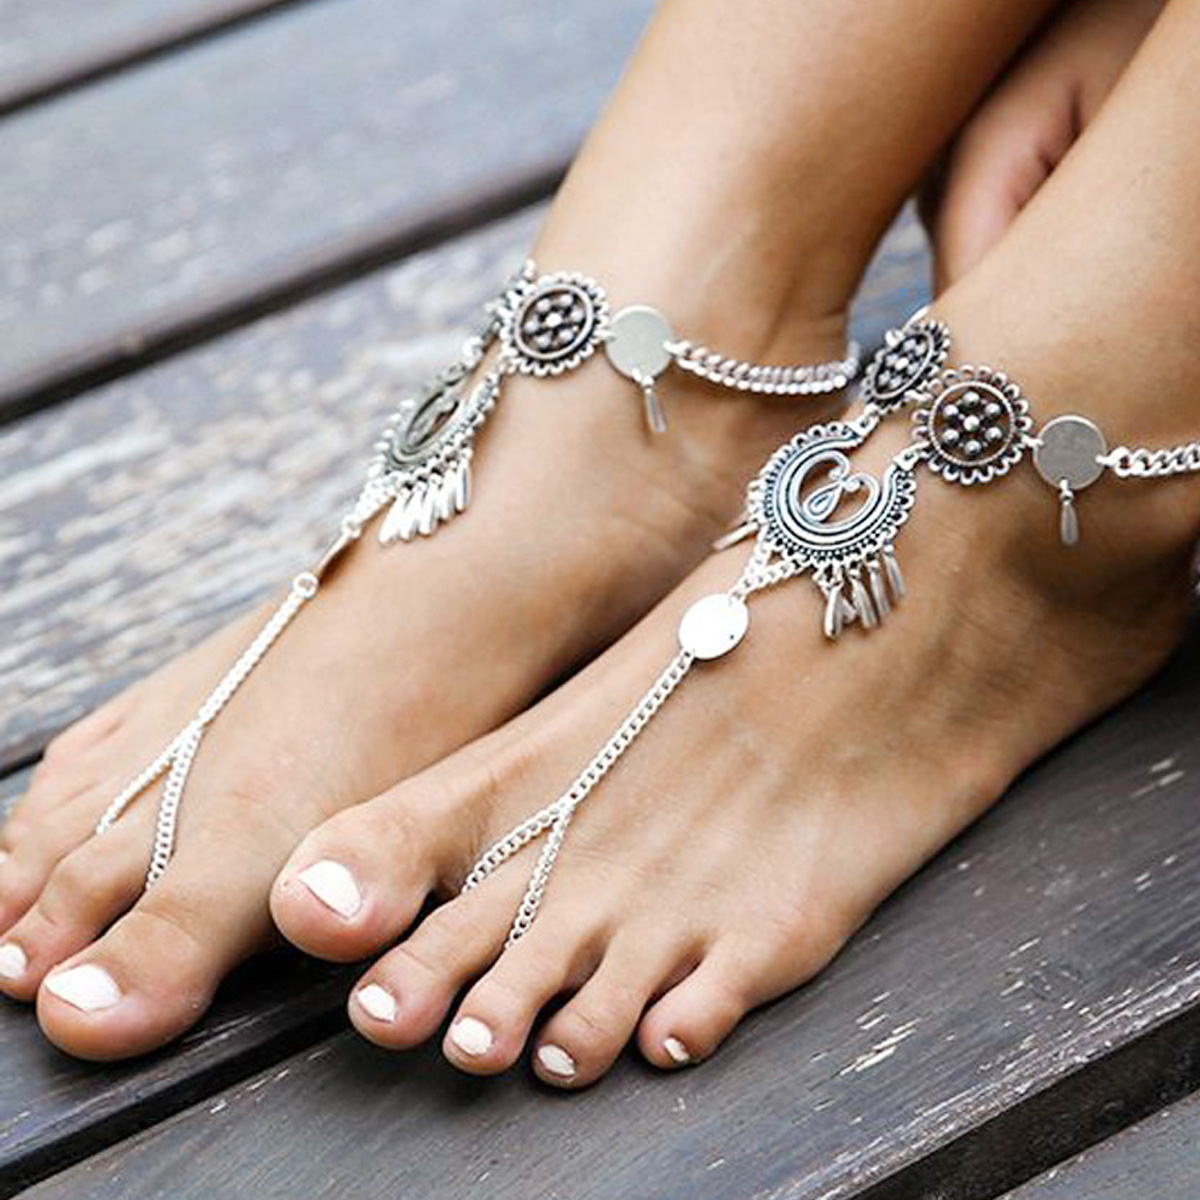 Браслеты через палец на ногу